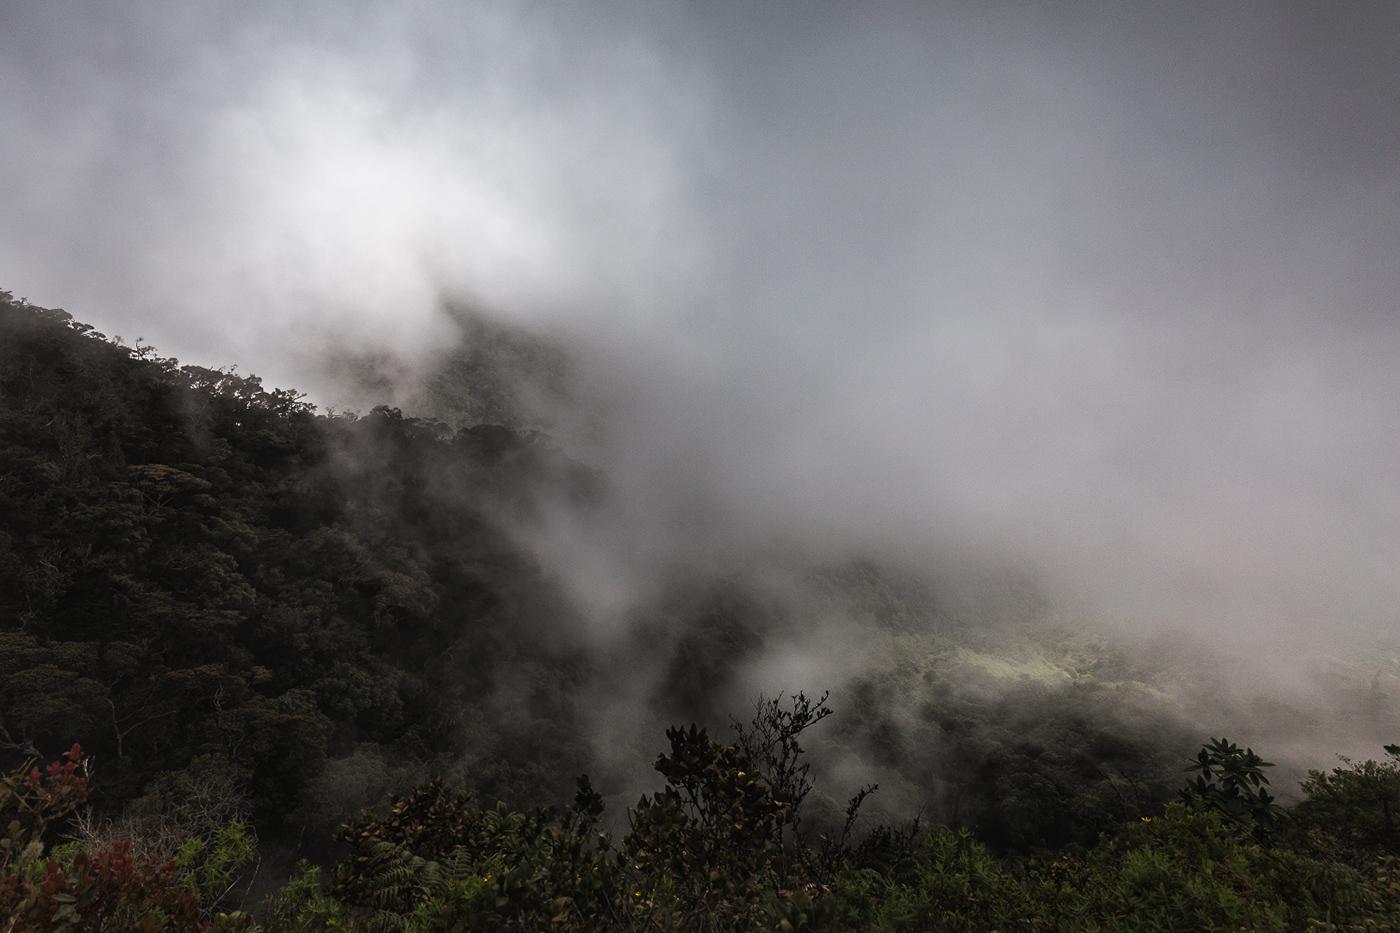 Image may contain: smoke, train and fog